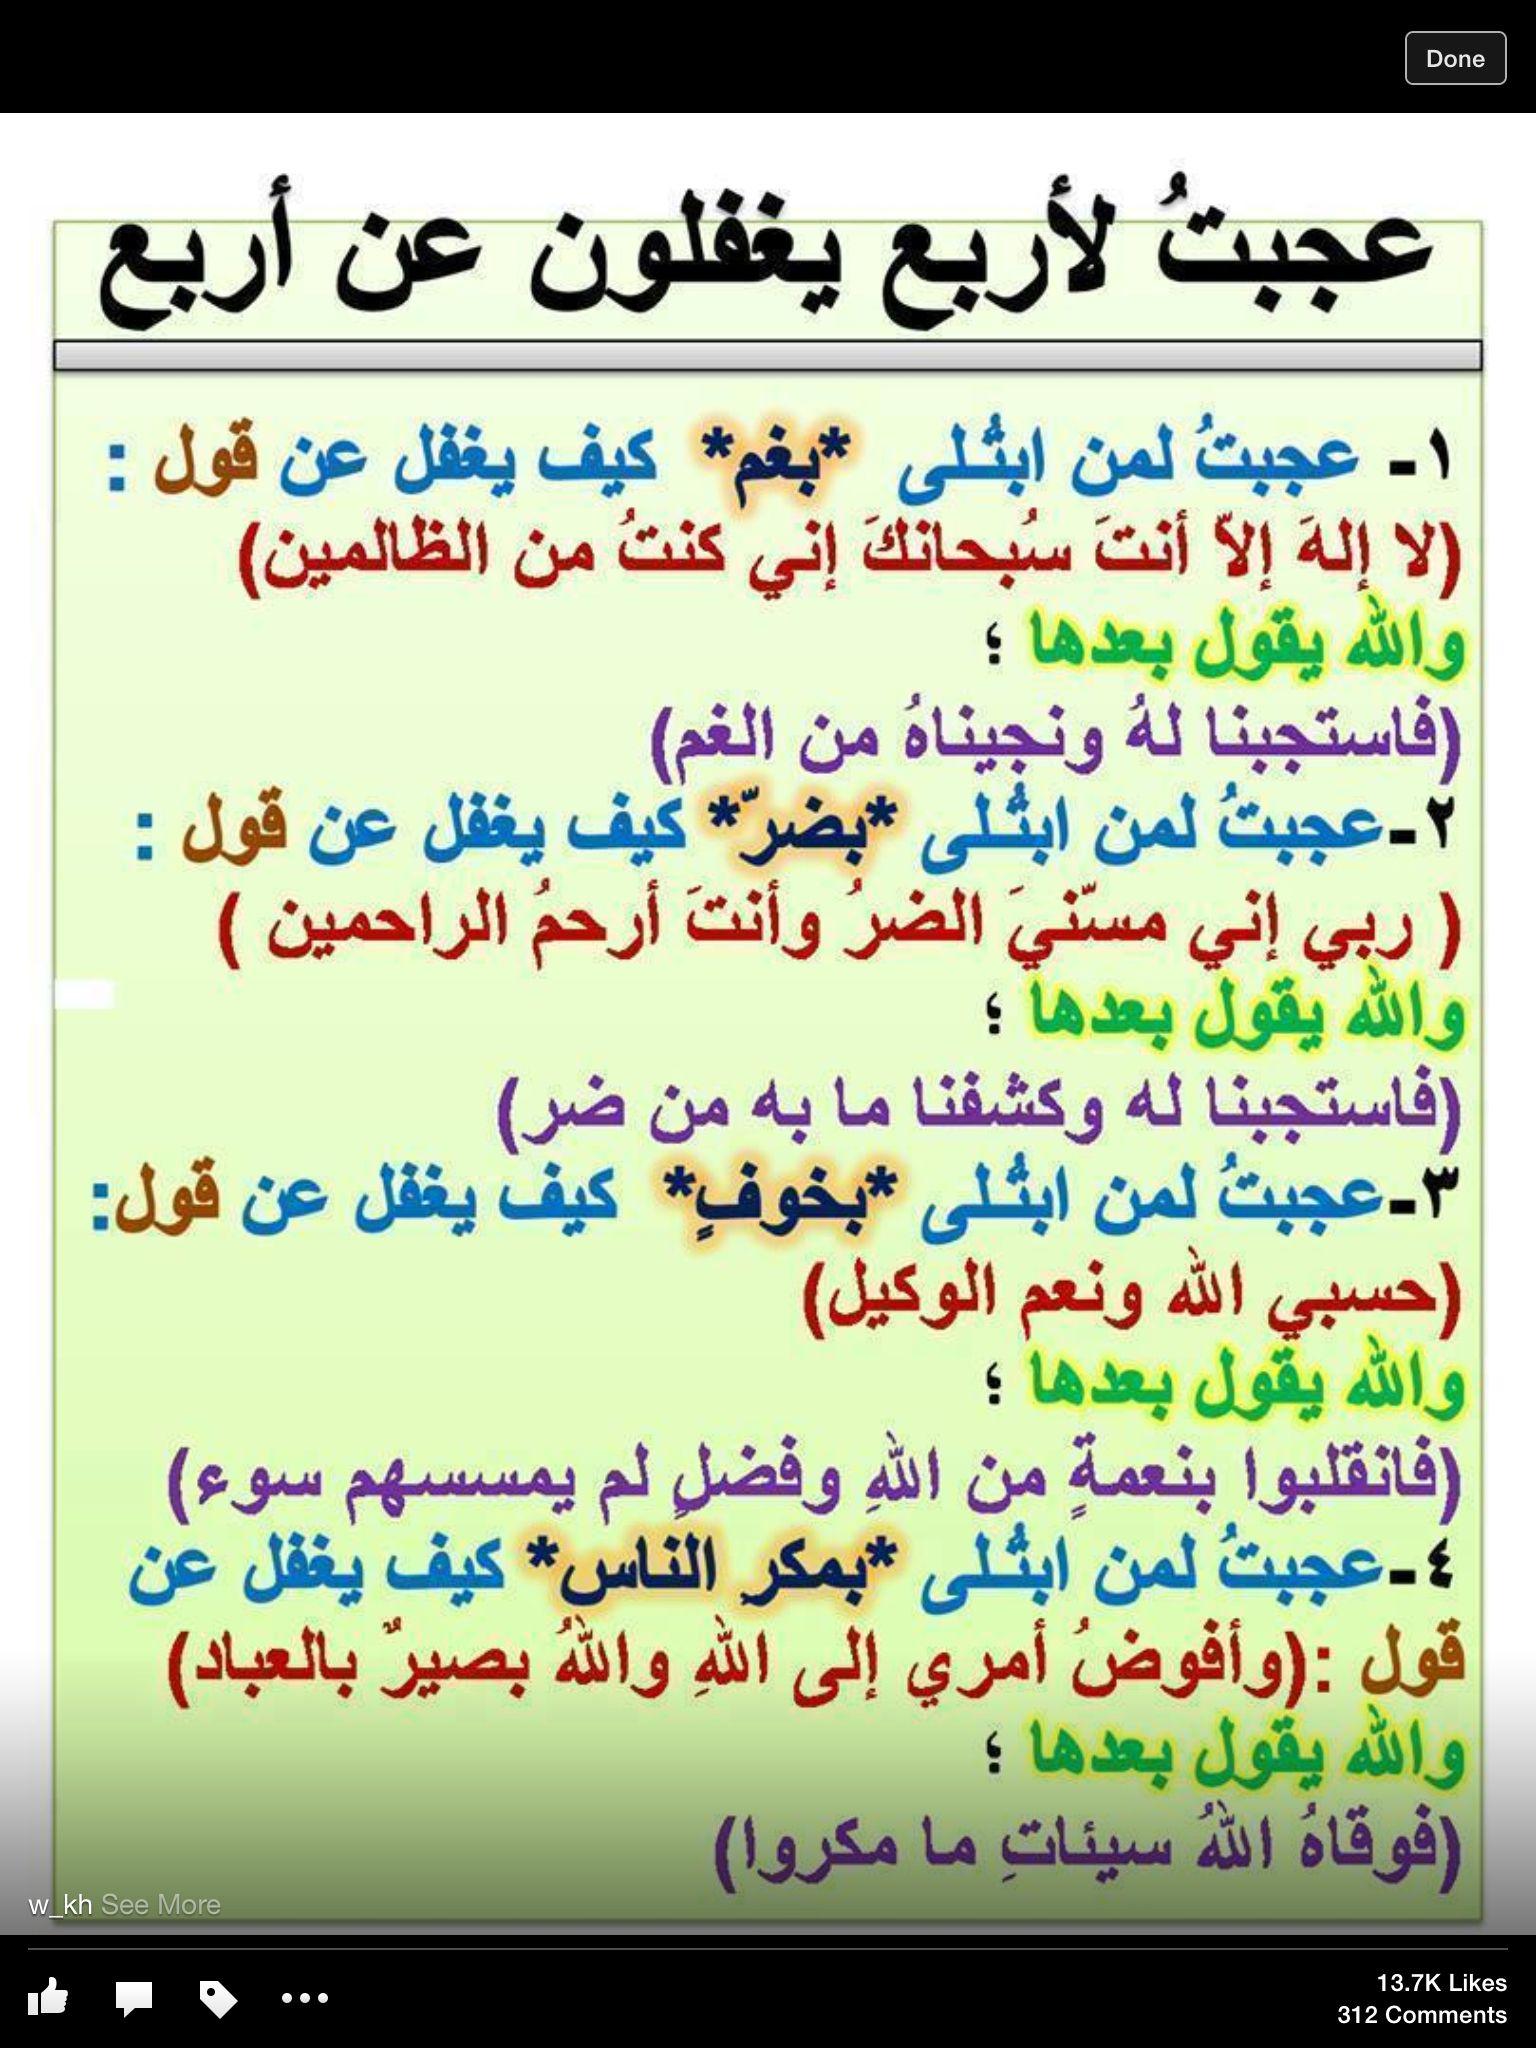 Pin By Mayss On الدعاء المستجاب Islam Beliefs Islam Facts Islamic Phrases